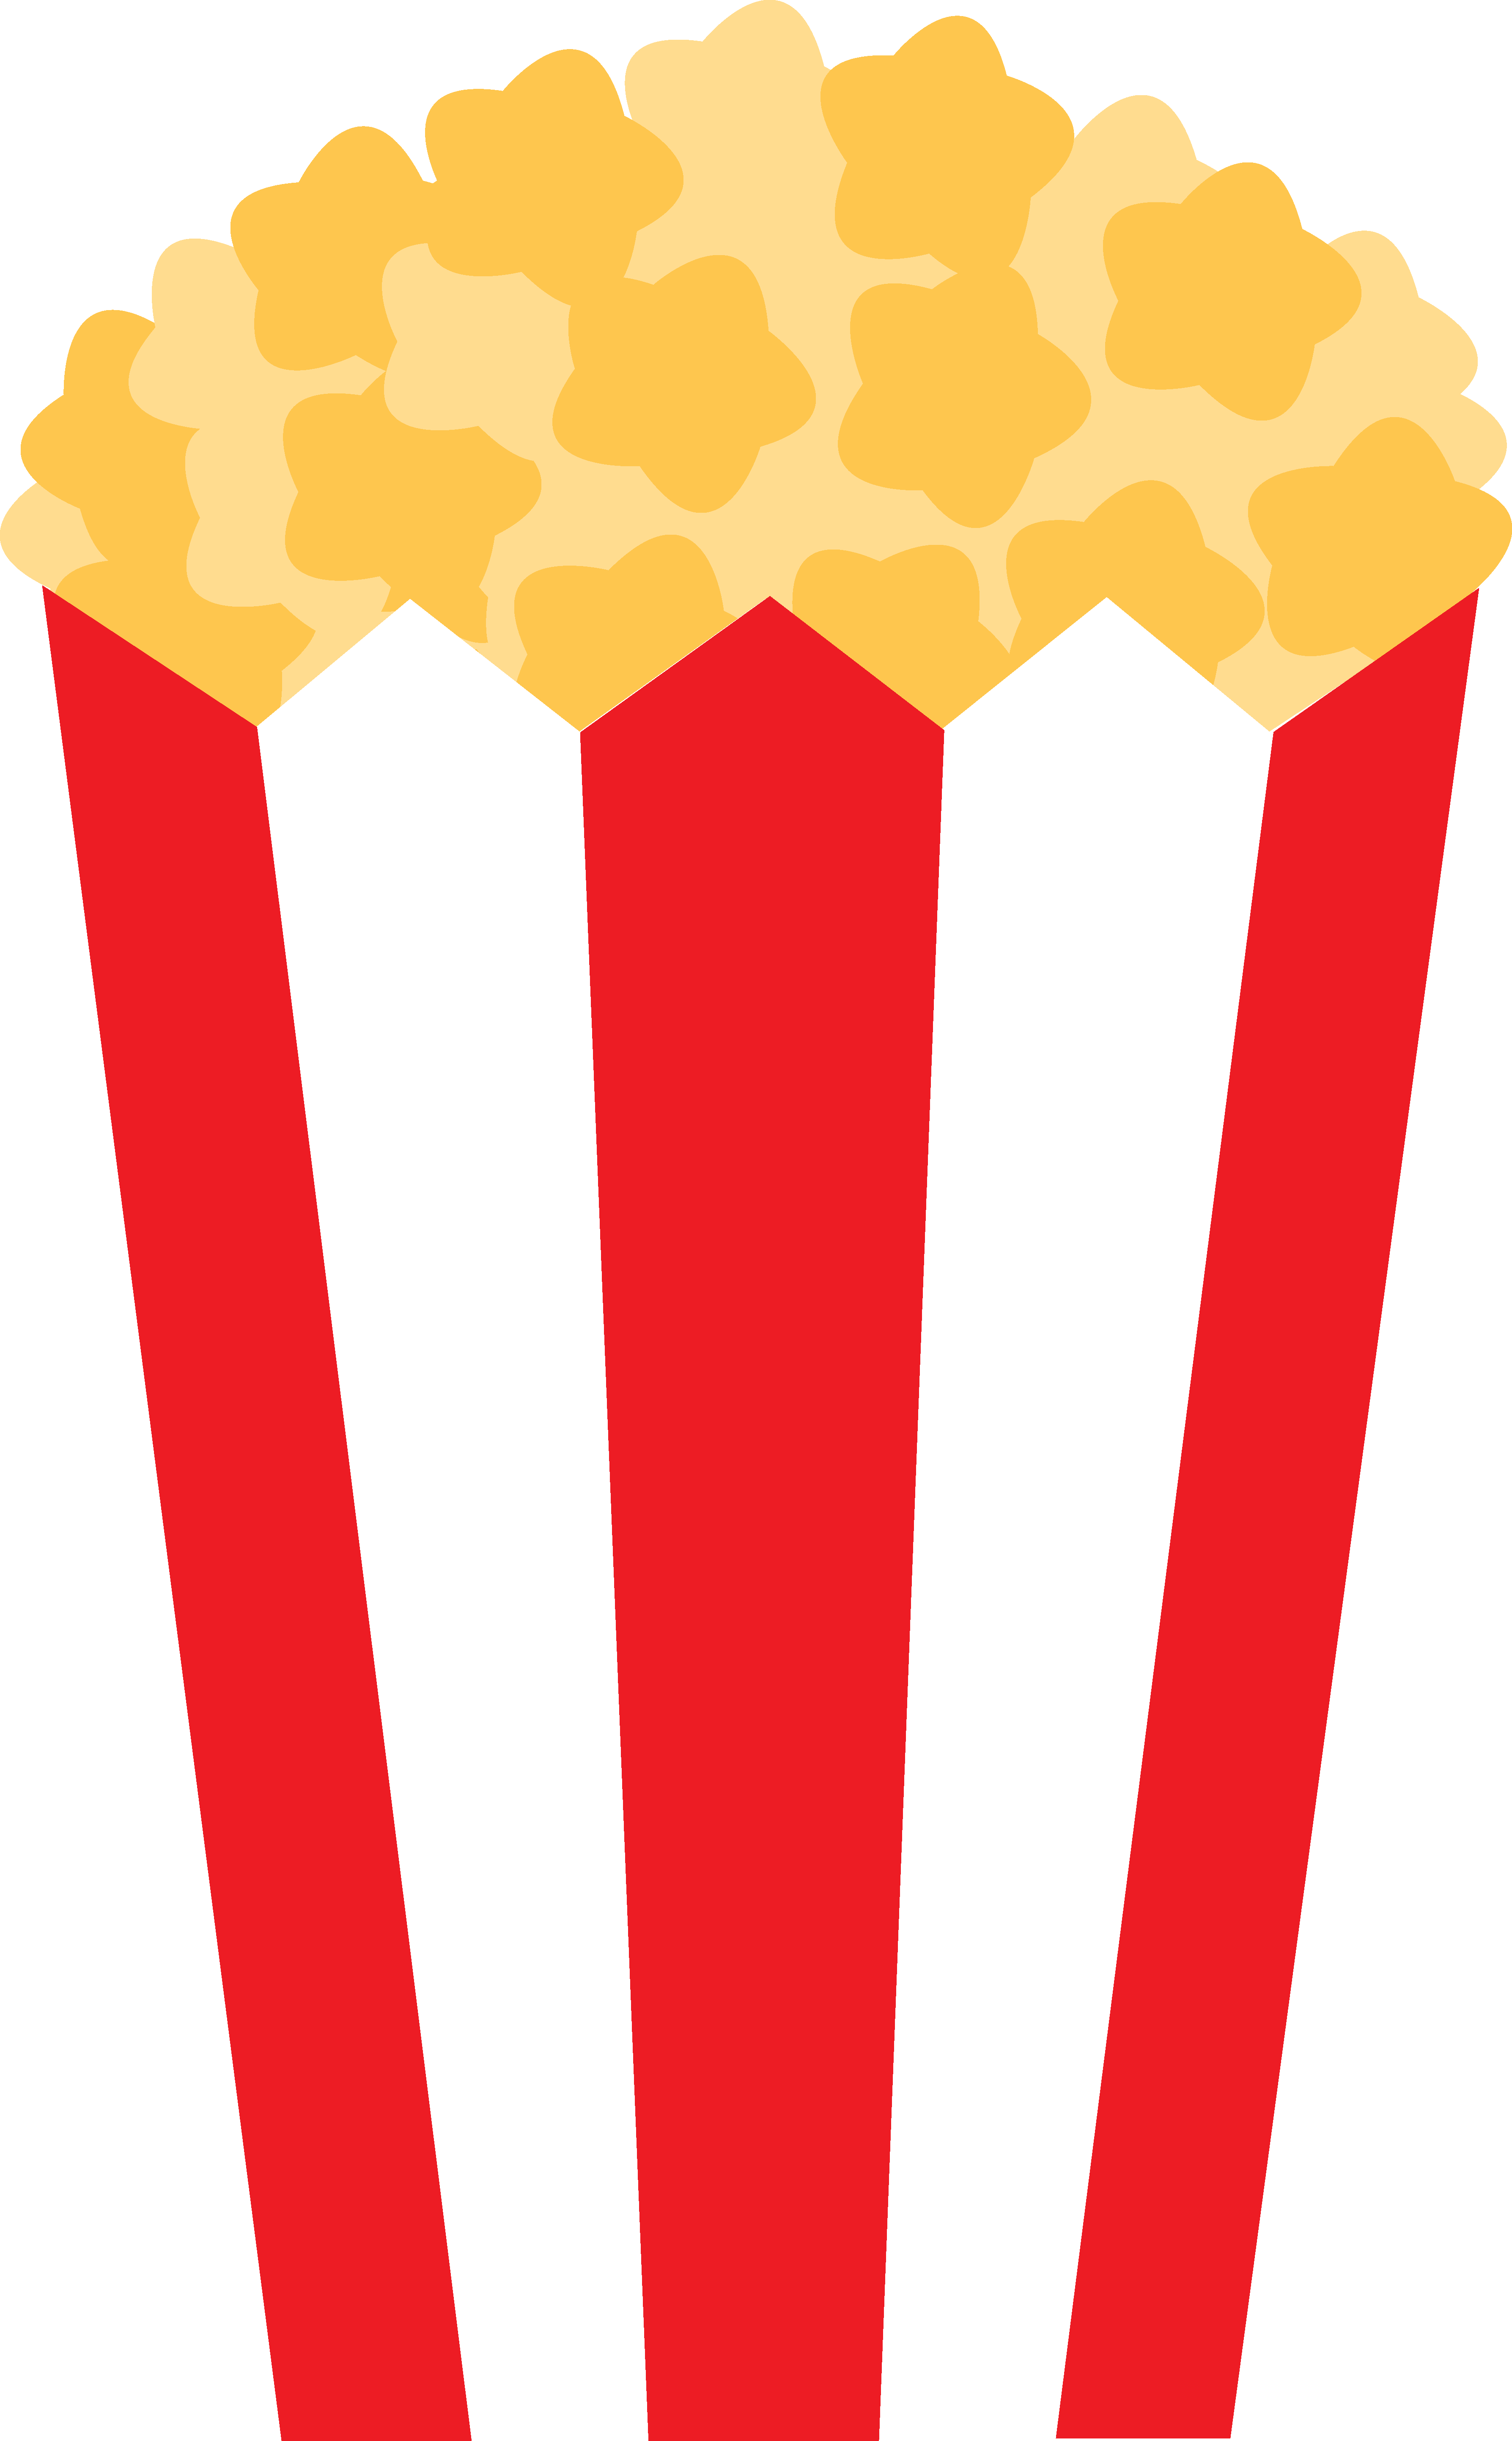 Movie free panda images. Ticket clipart popcorn